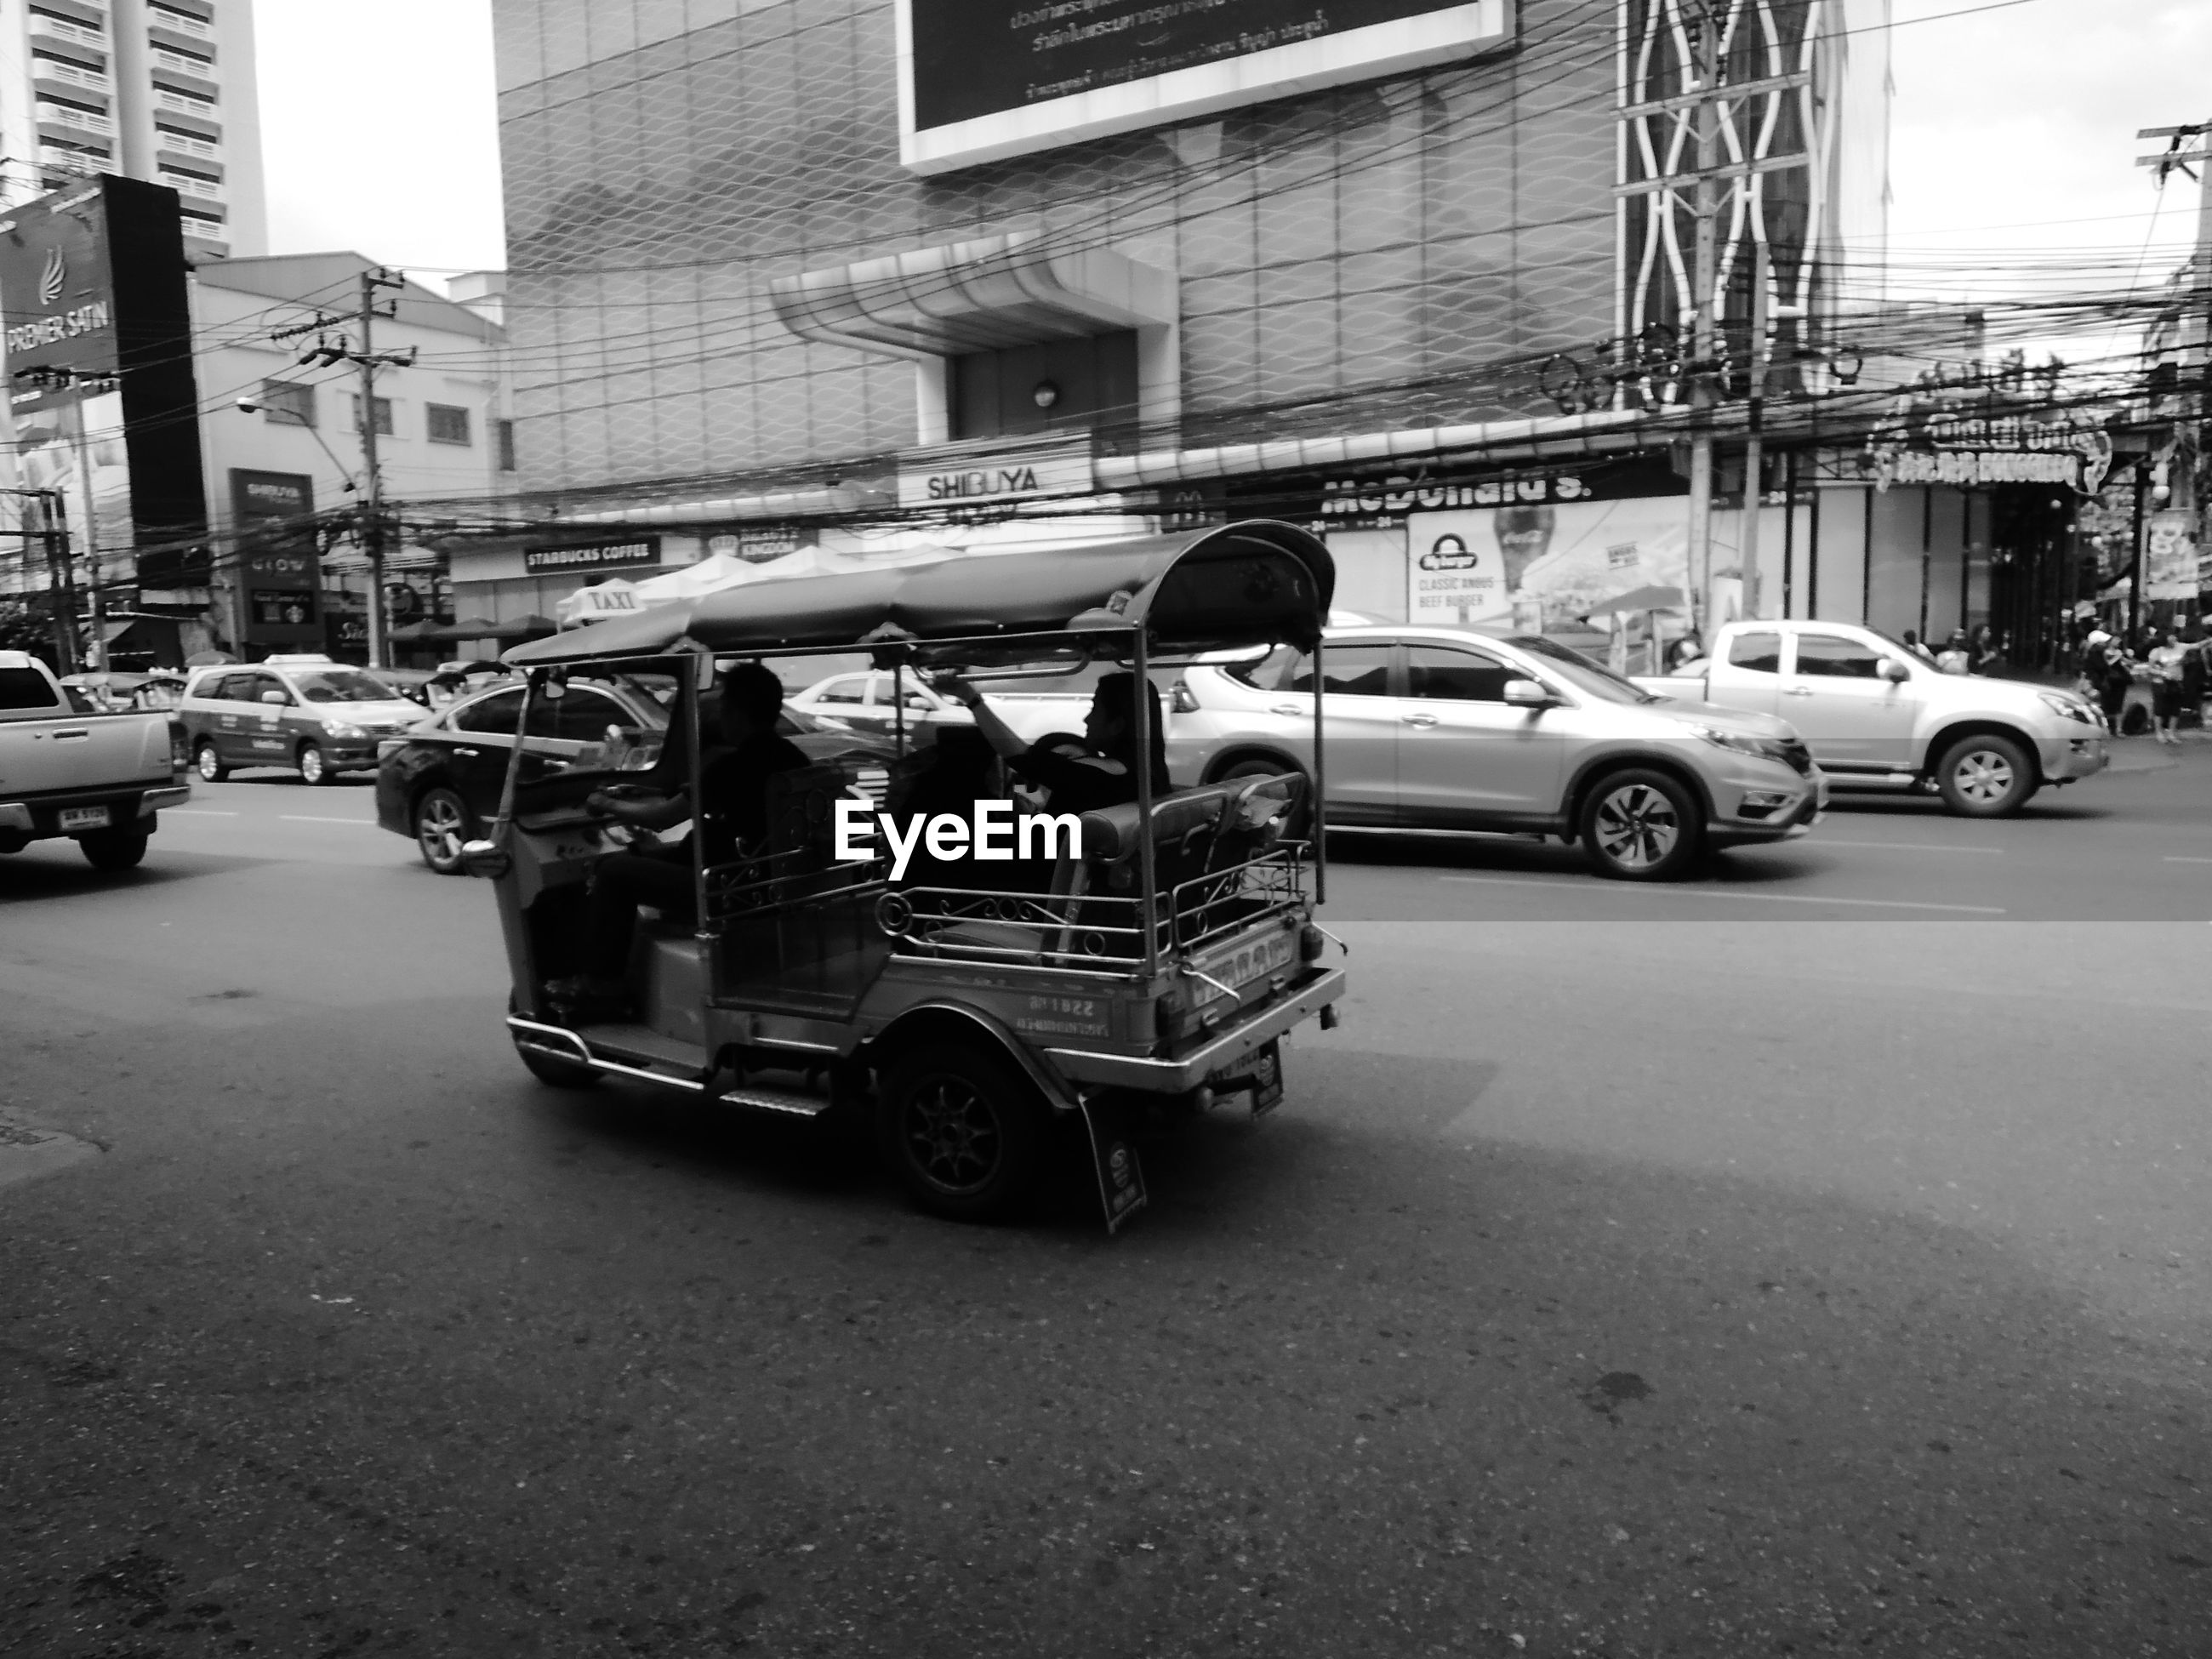 MAN ON CAR ON STREET IN CITY